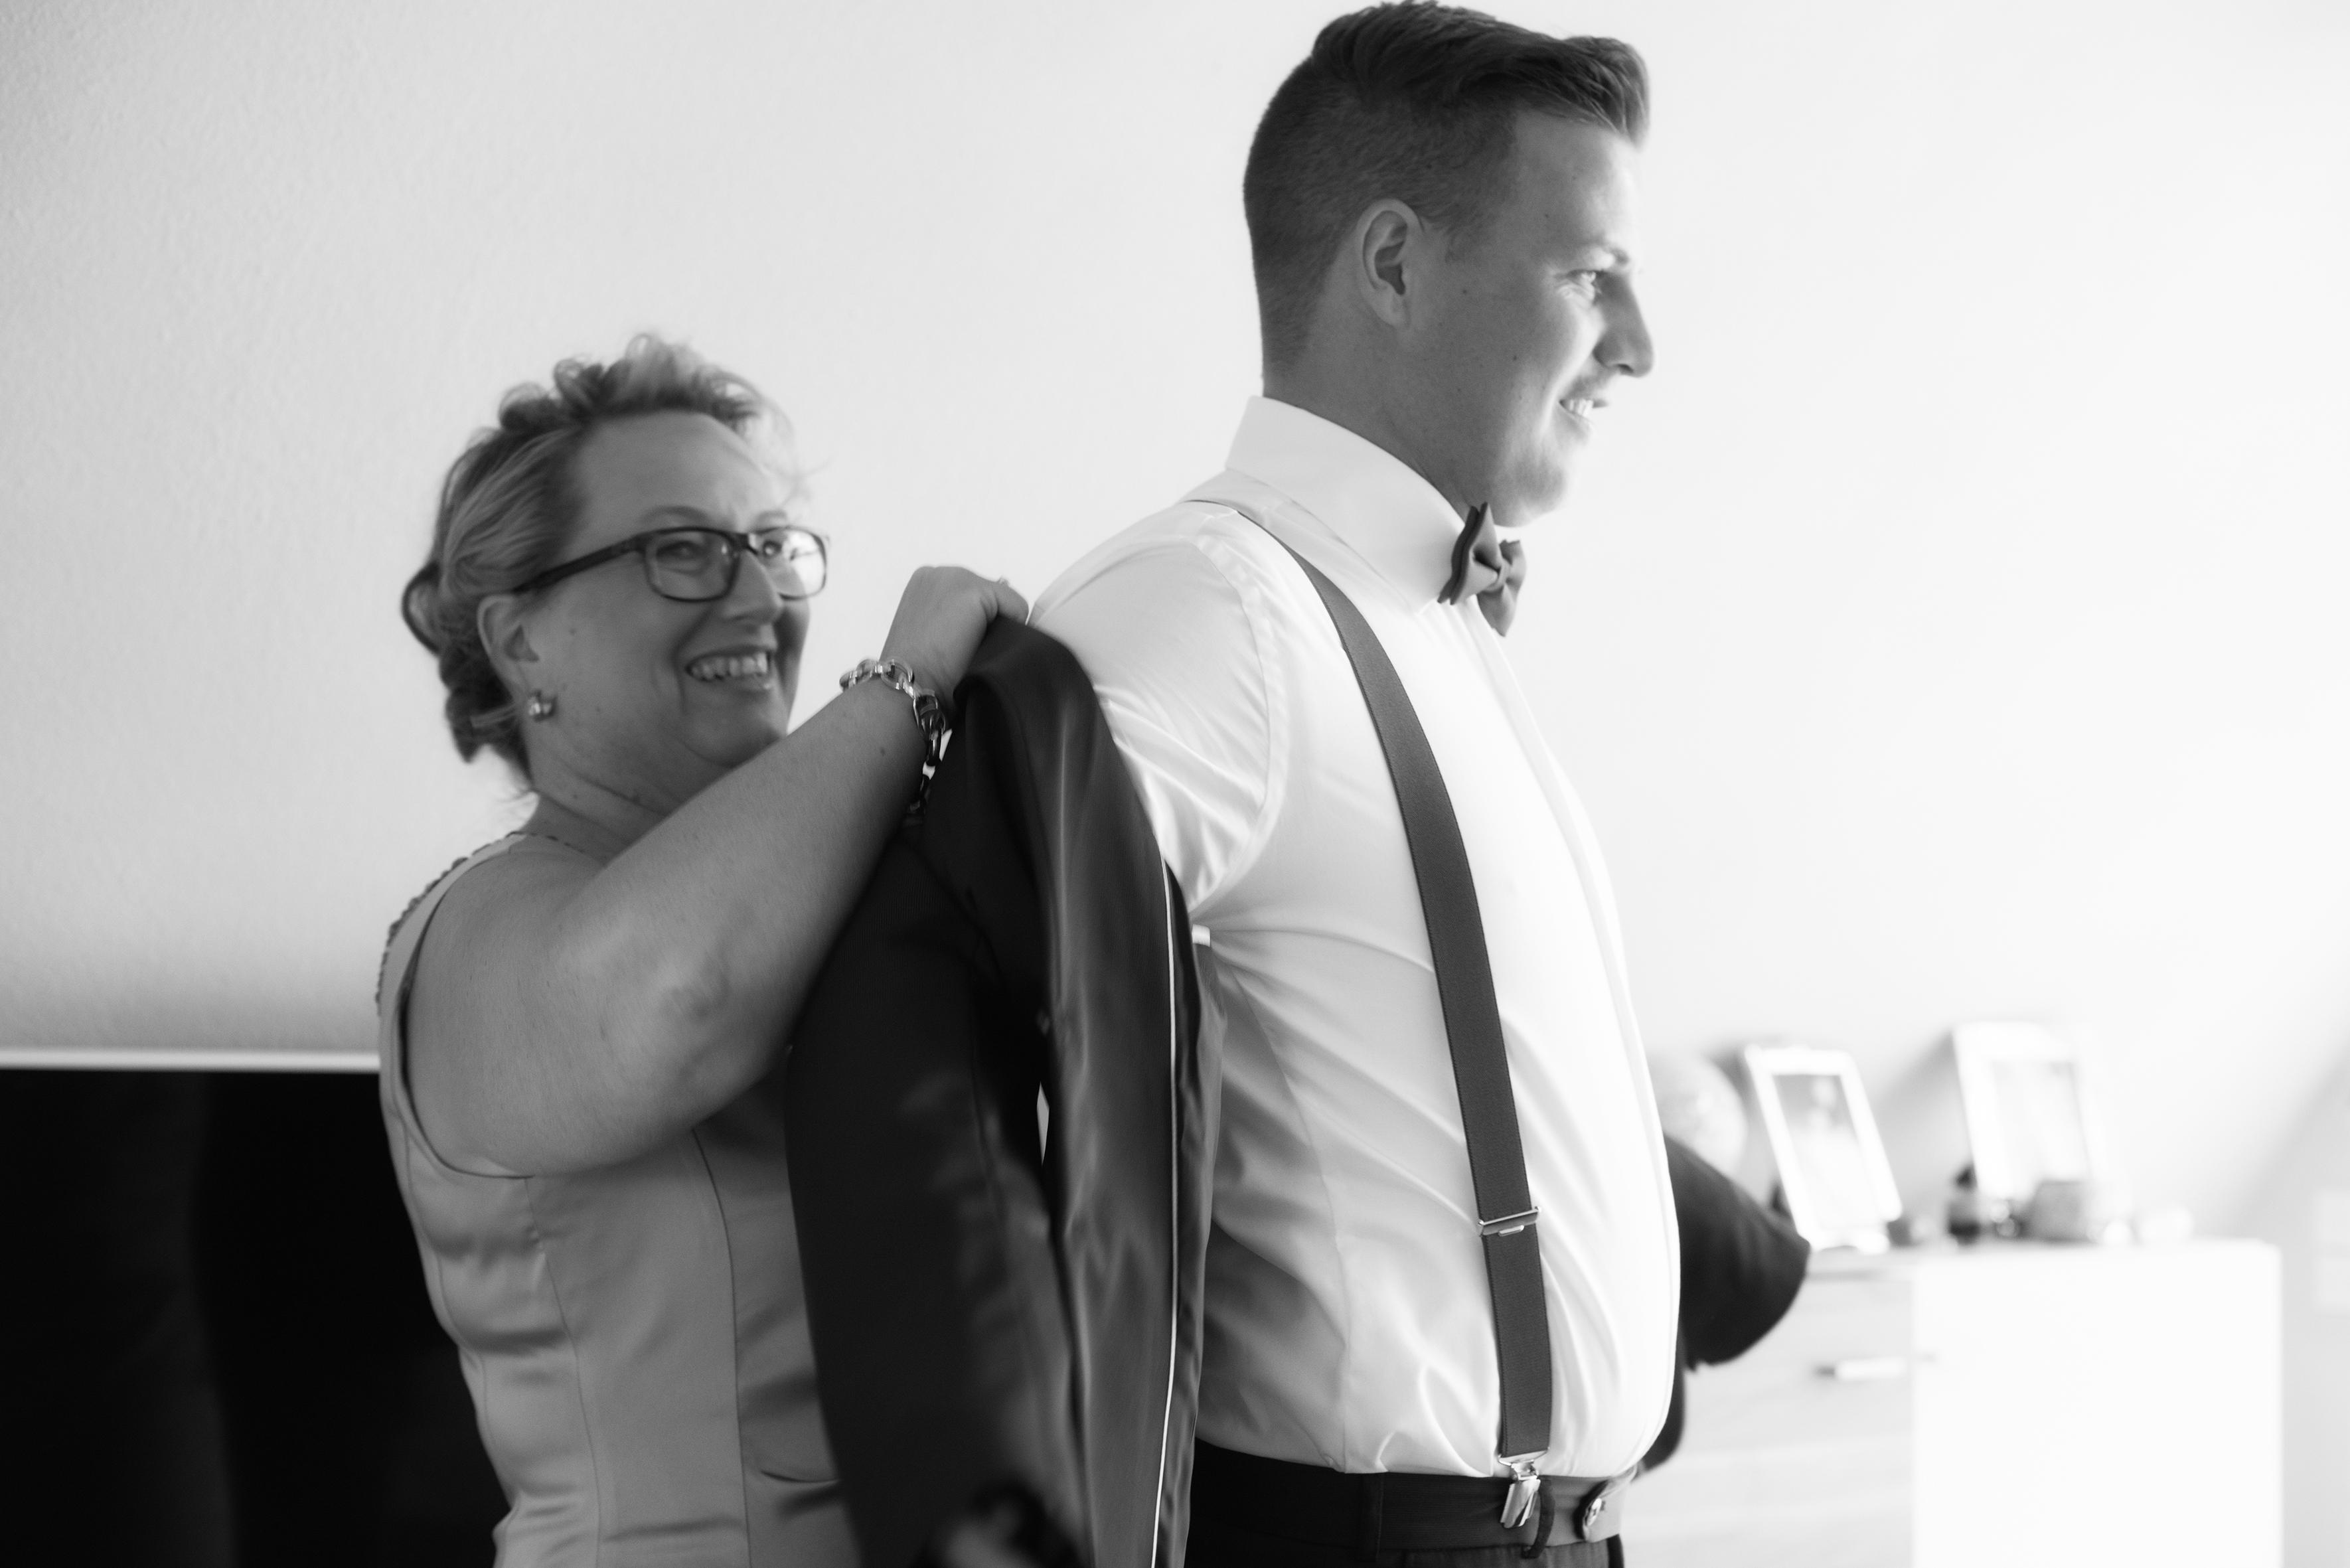 Hochzeitreportage Landau